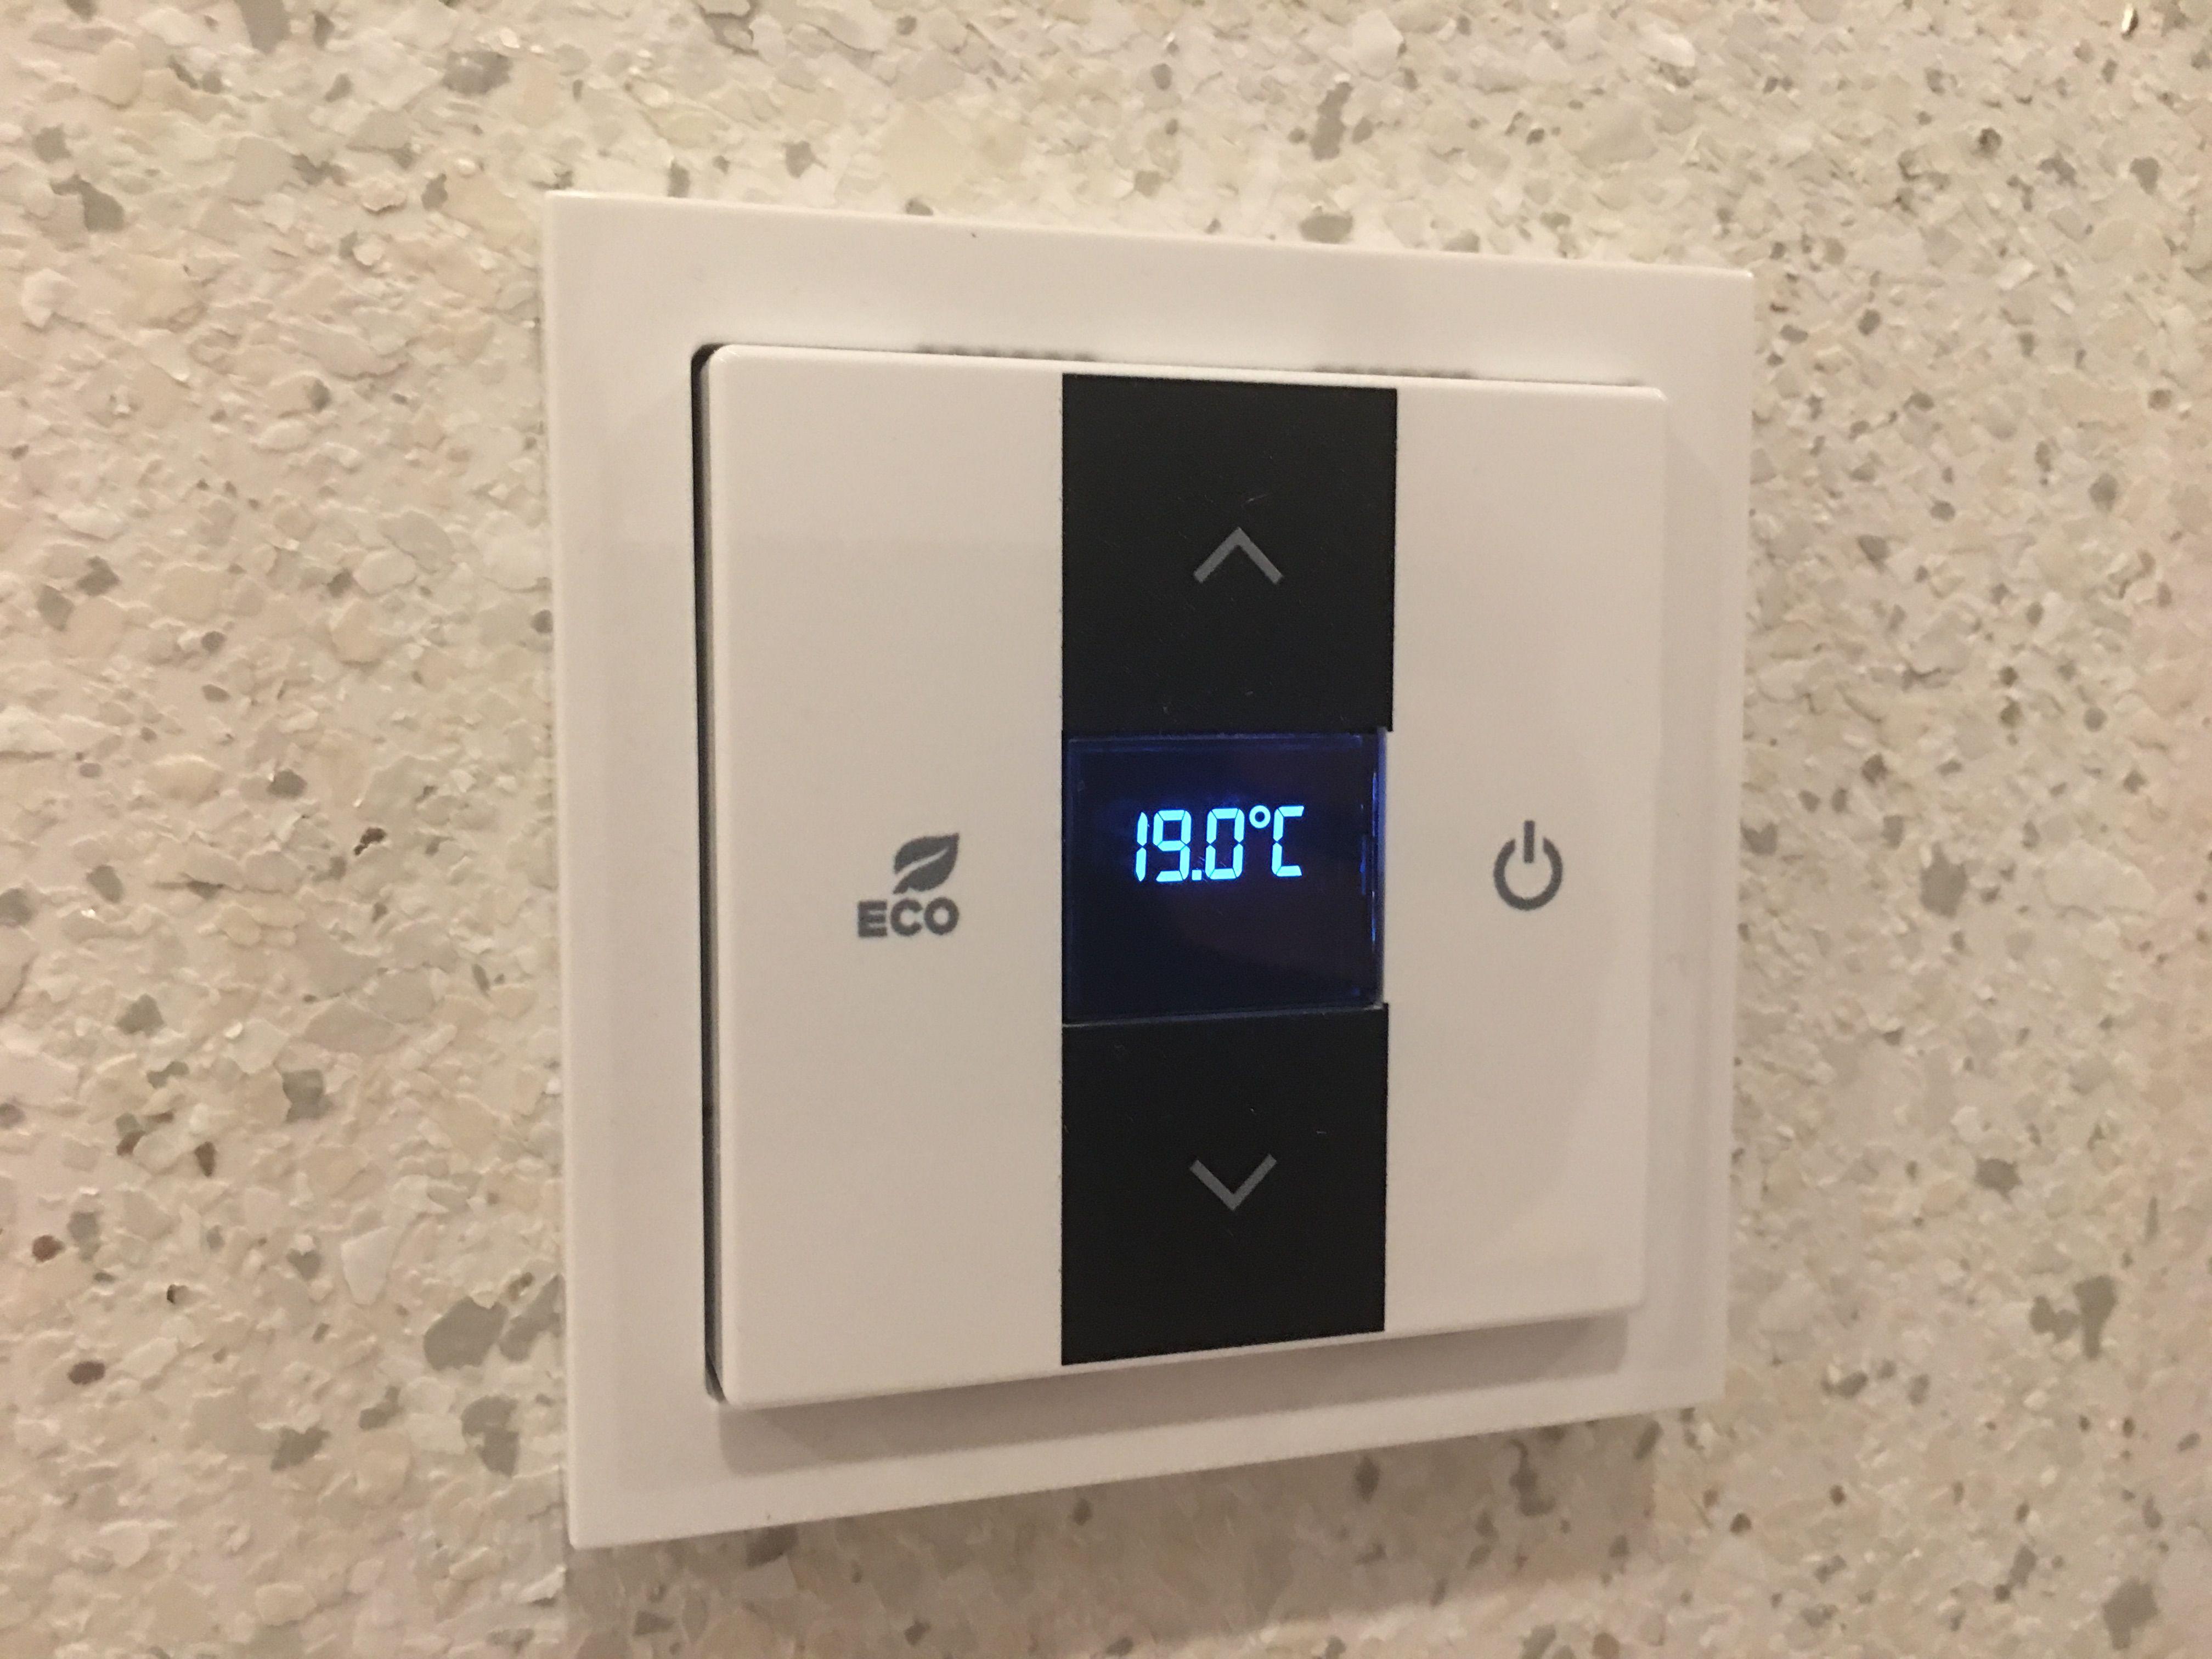 Busch Jaeger Free Home Raumtemperaturregler Schalterprogramm Thermostat Produkt